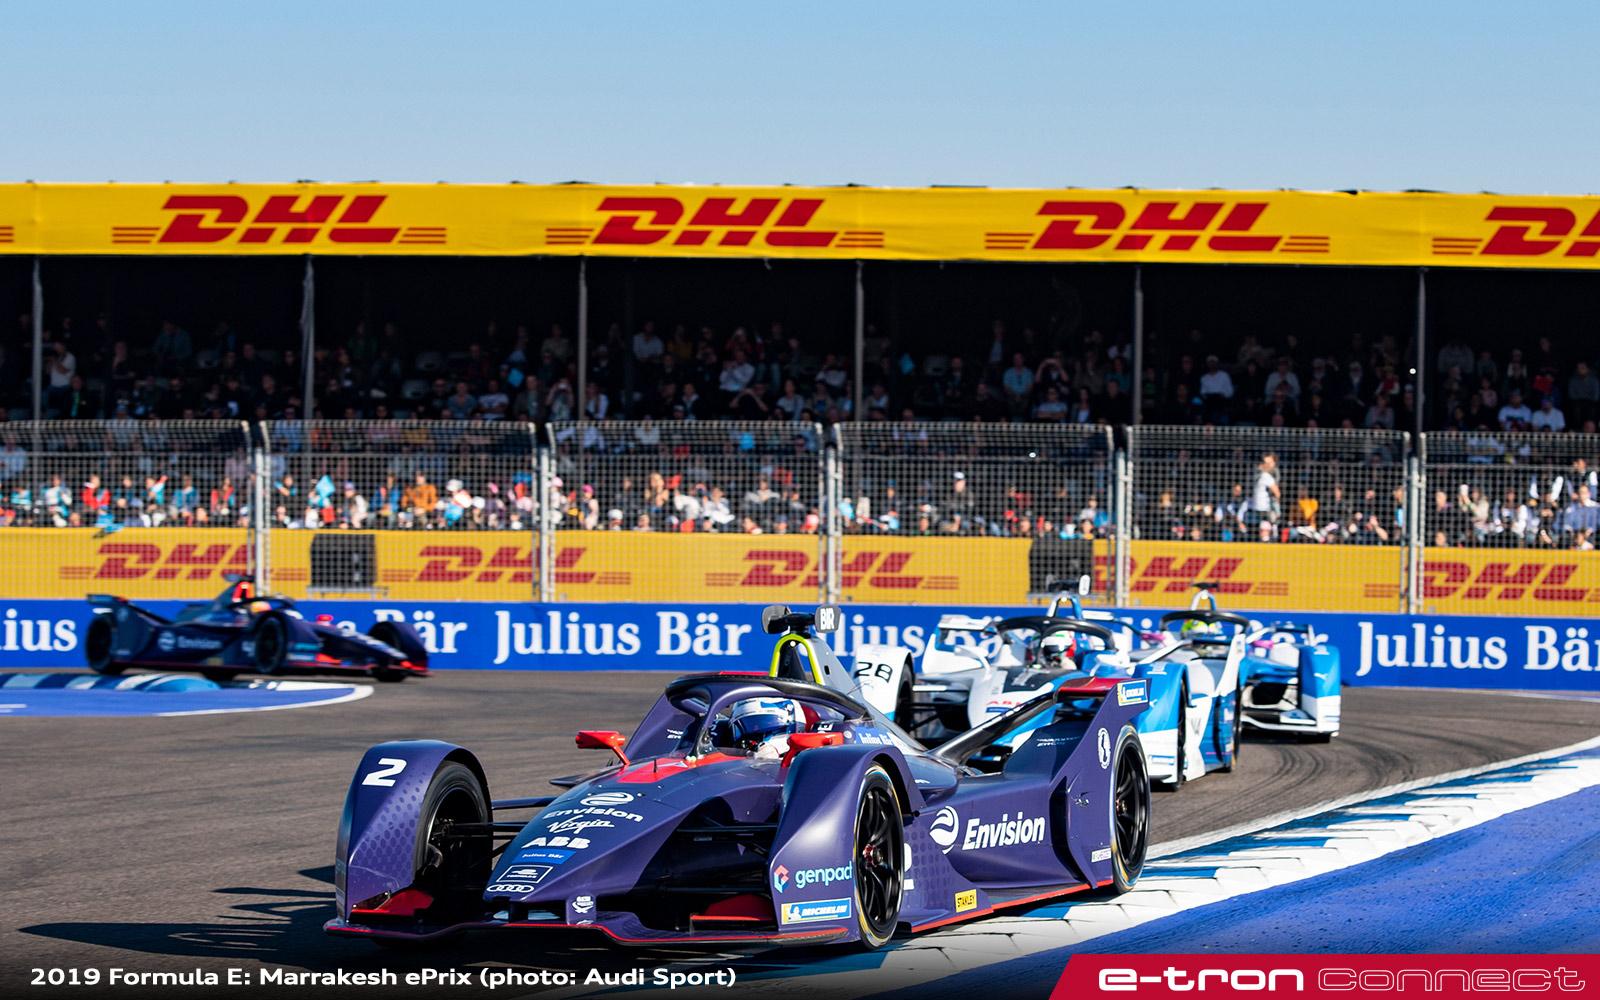 2019-fia-formula-e-marrakesh-audi-sport-509 - e-tron connect